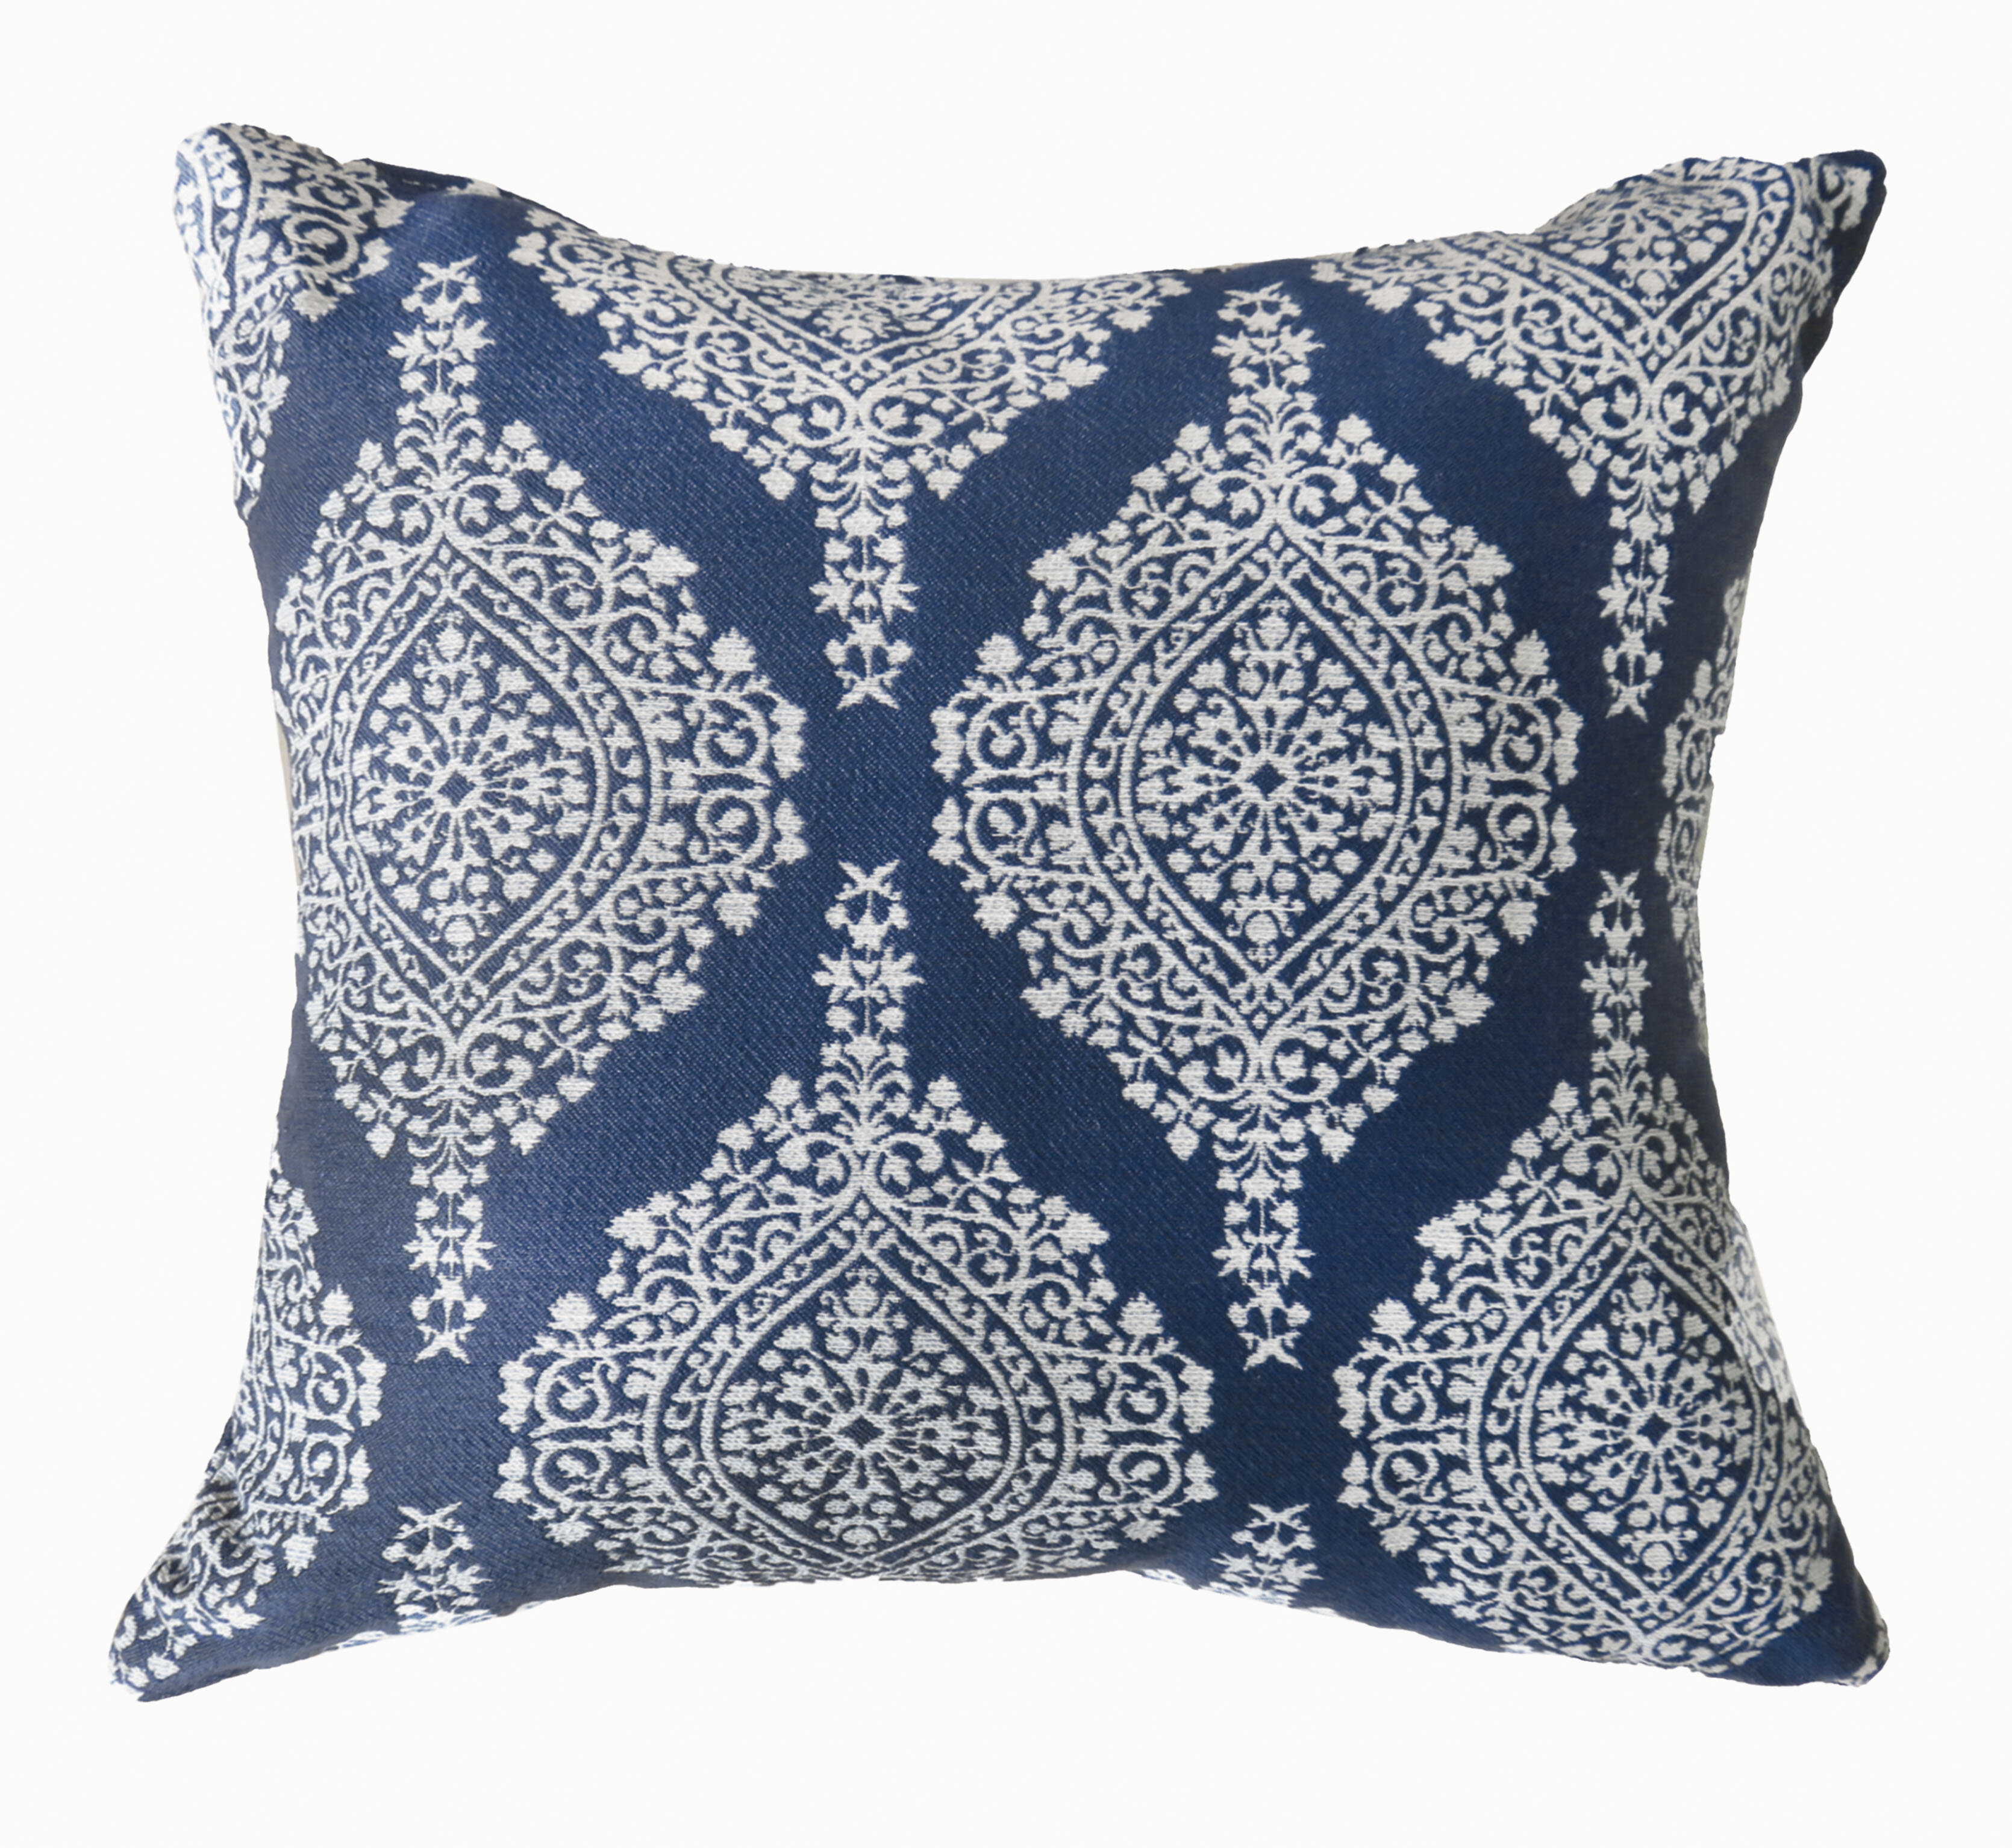 Evansville Contemporary Throw Pillow